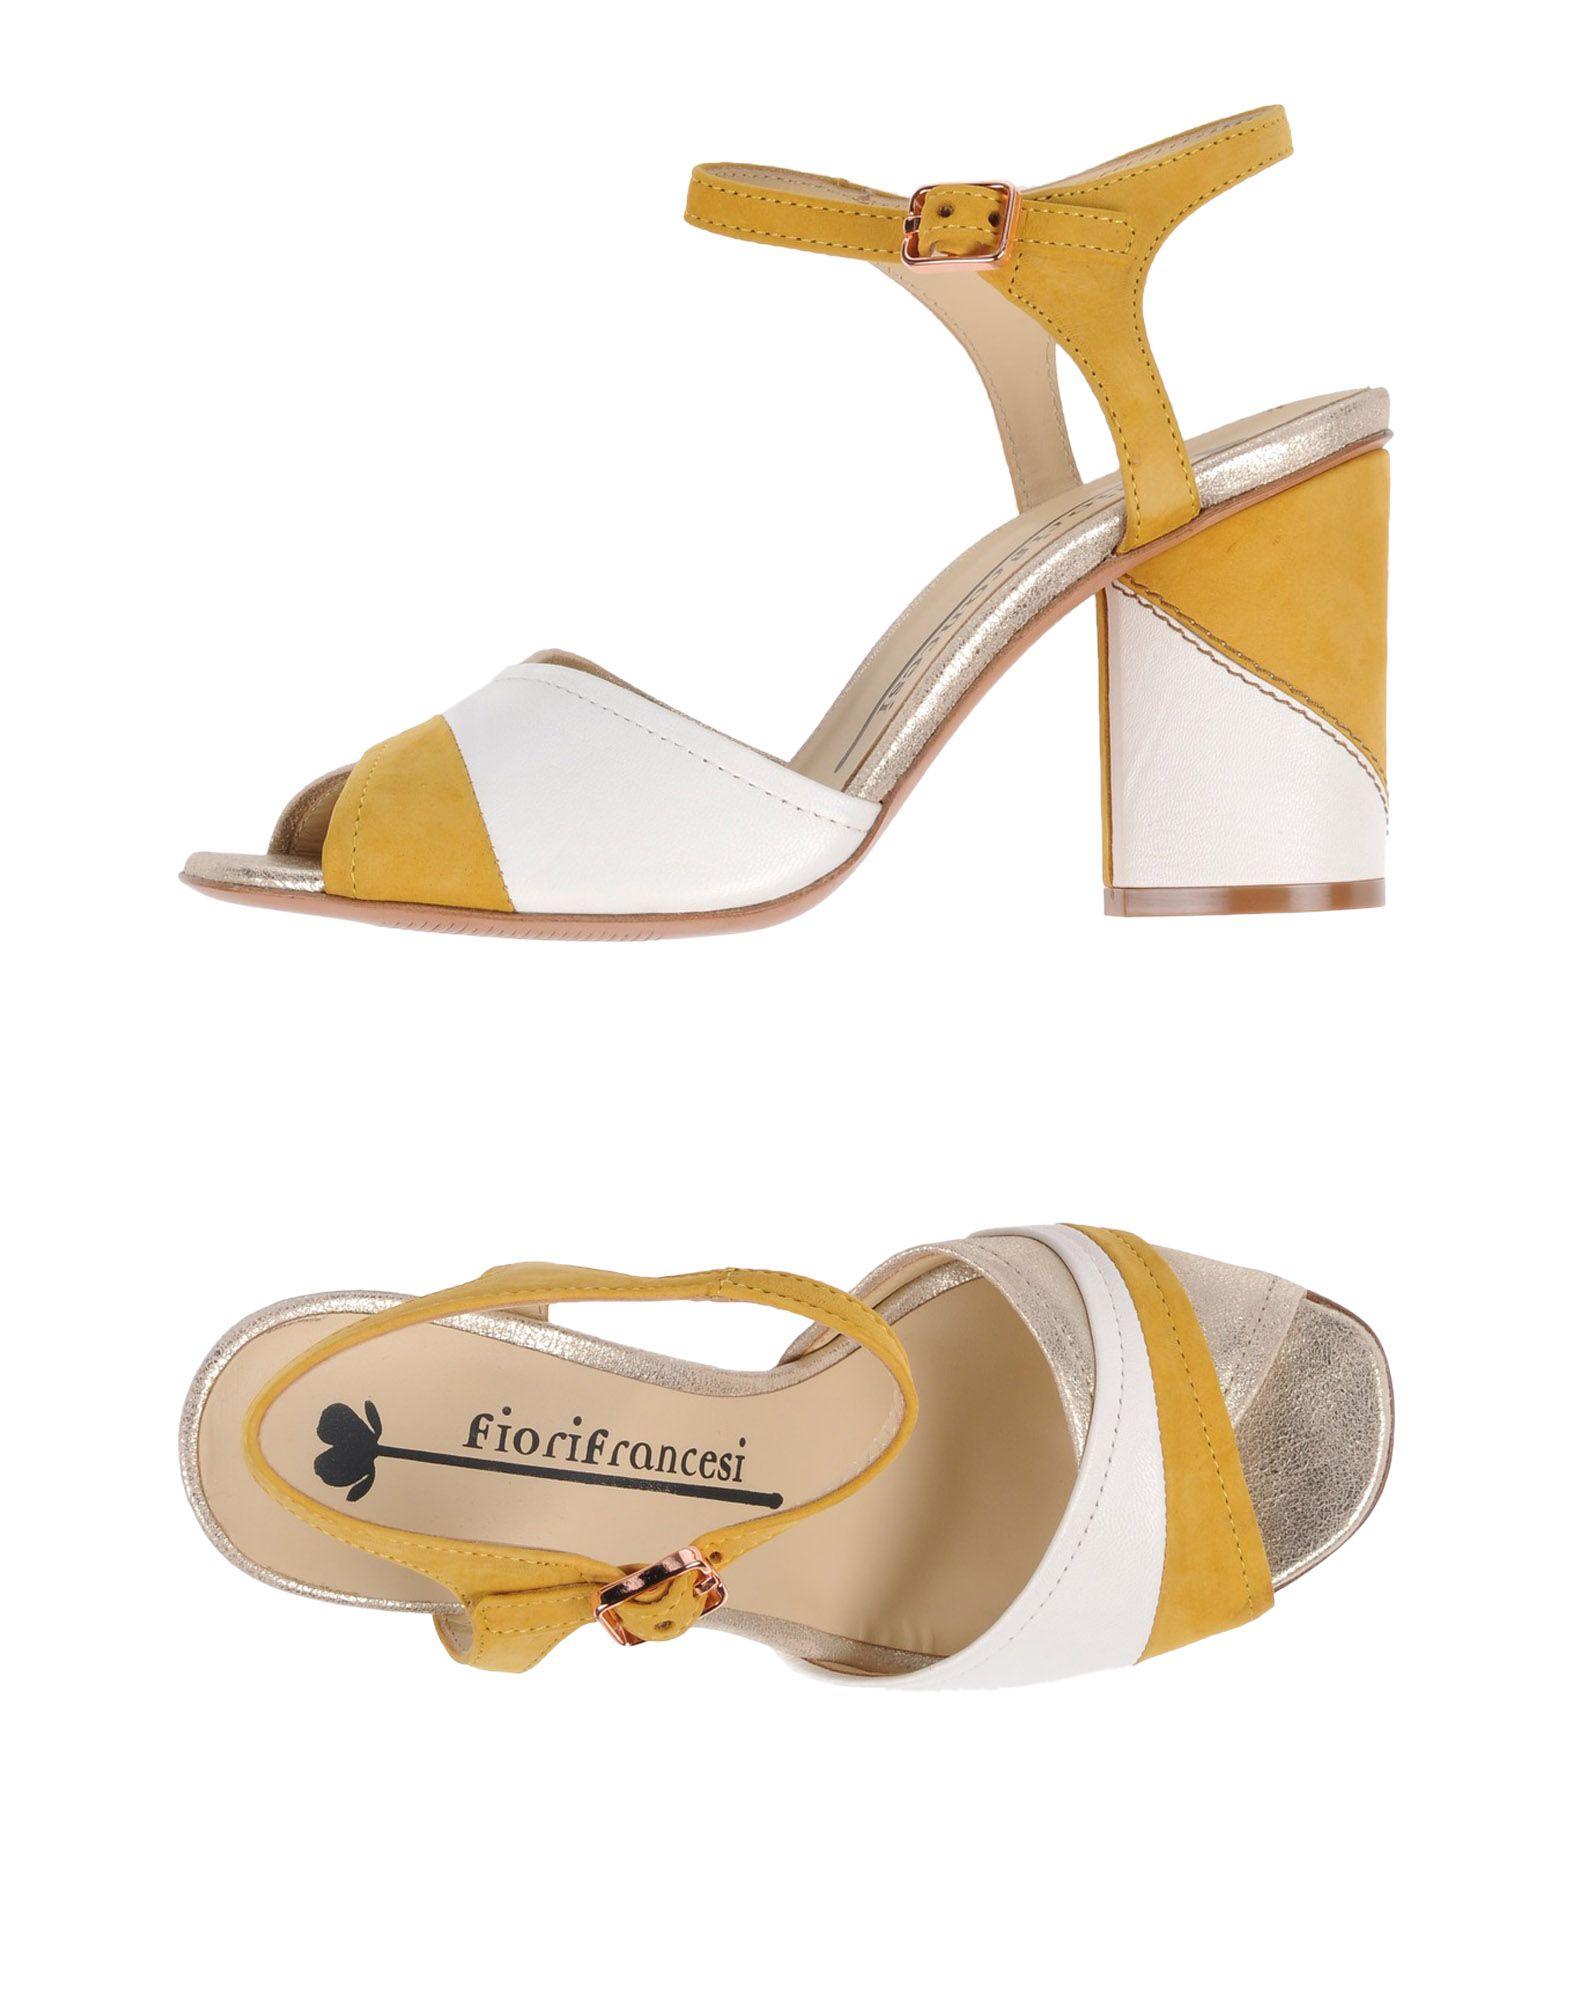 Fiorifrancesi Sandalen Damen  11456715VW Gute Qualität beliebte Schuhe